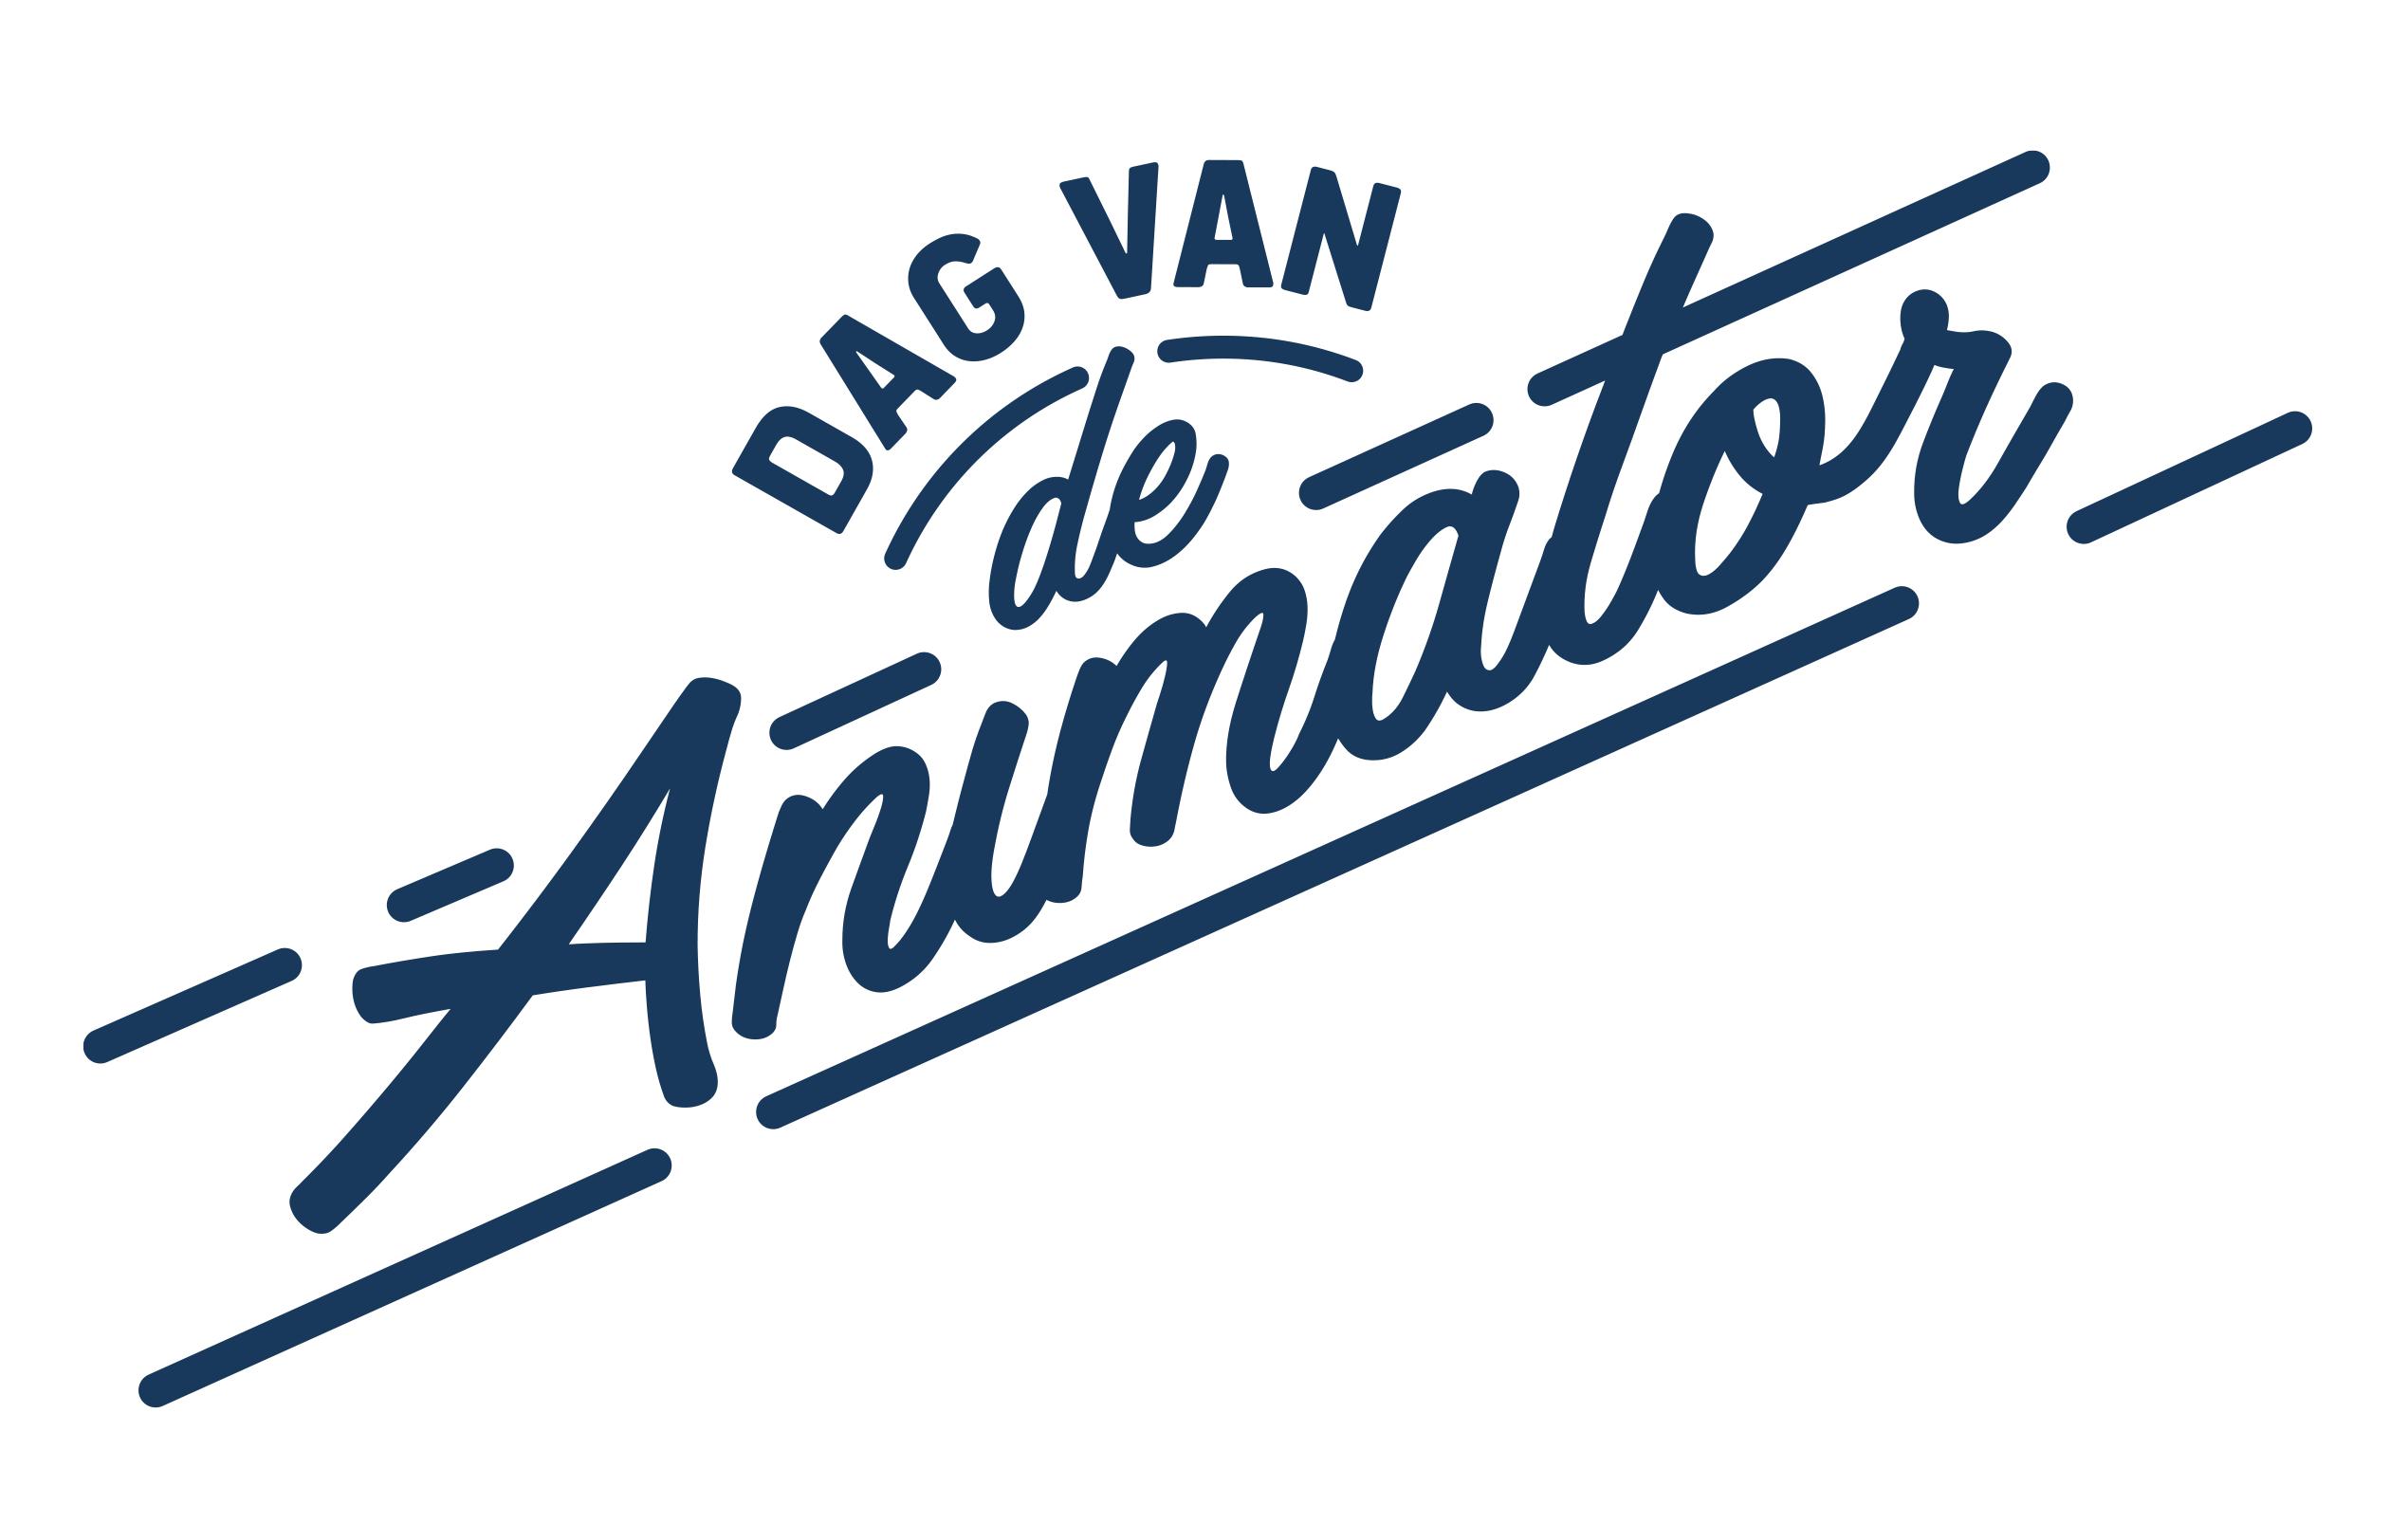 Dag van de Animator